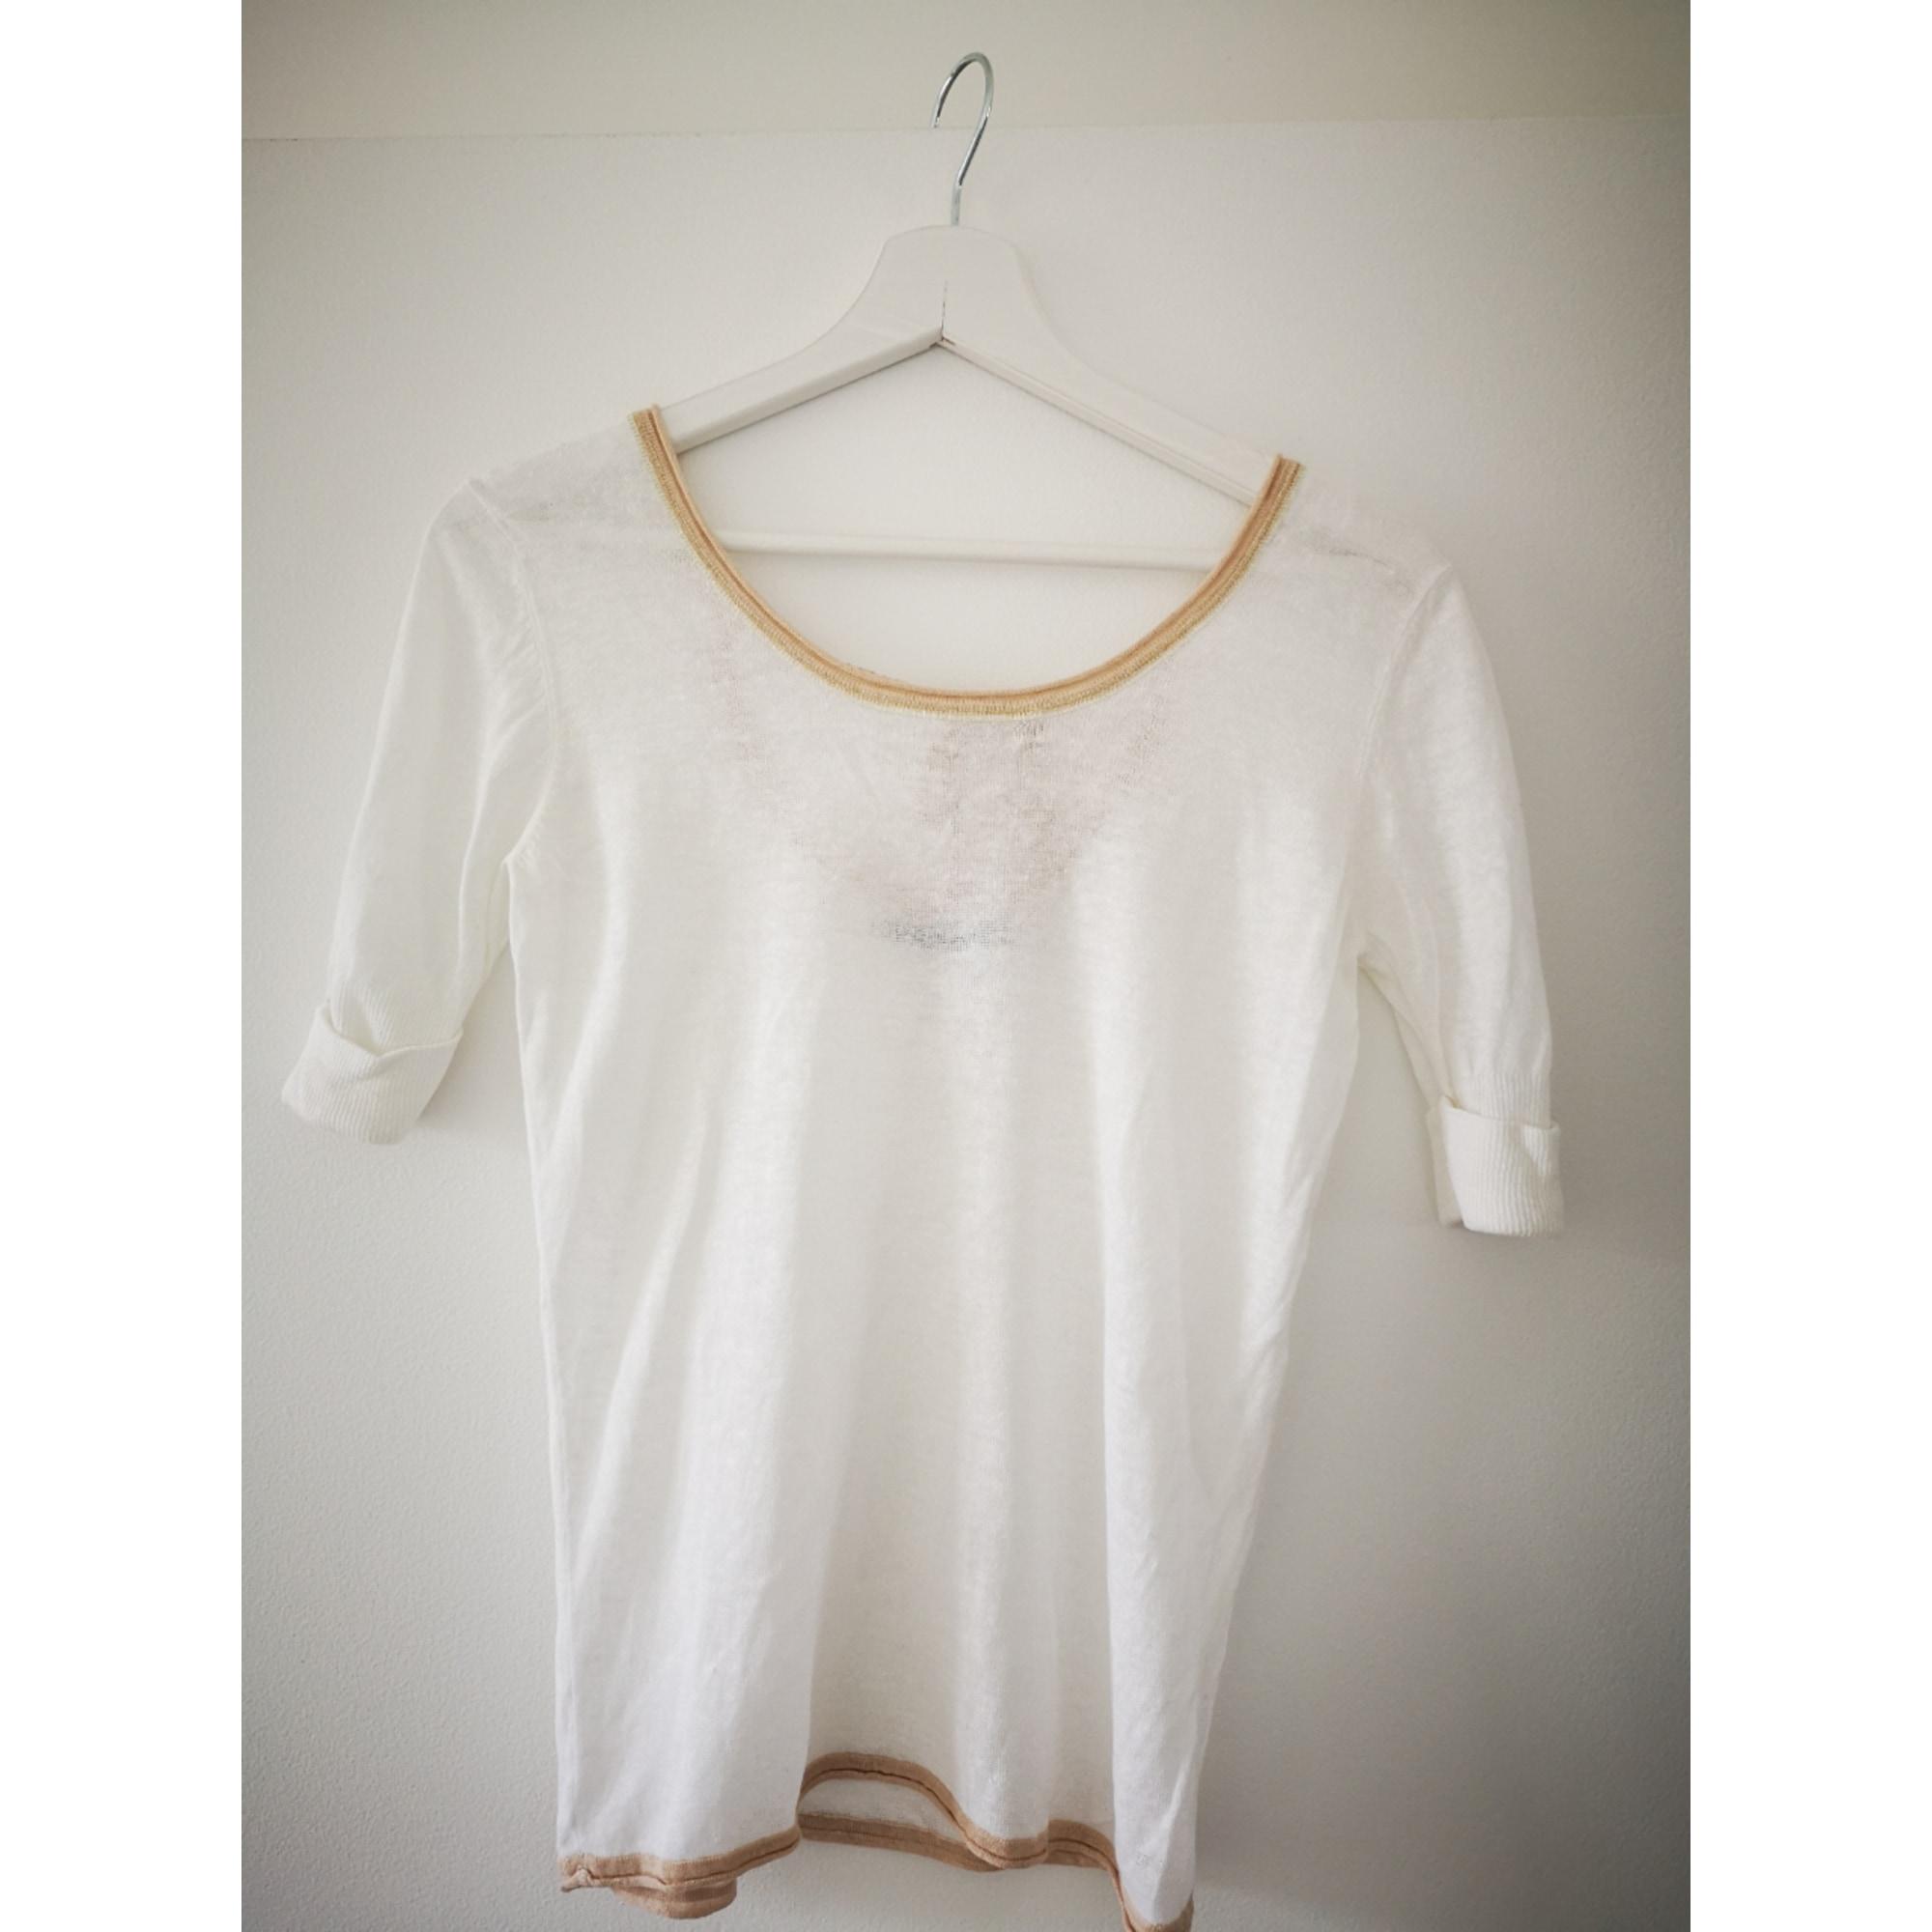 Top, tee-shirt KOOKAI Blanc, blanc cassé, écru